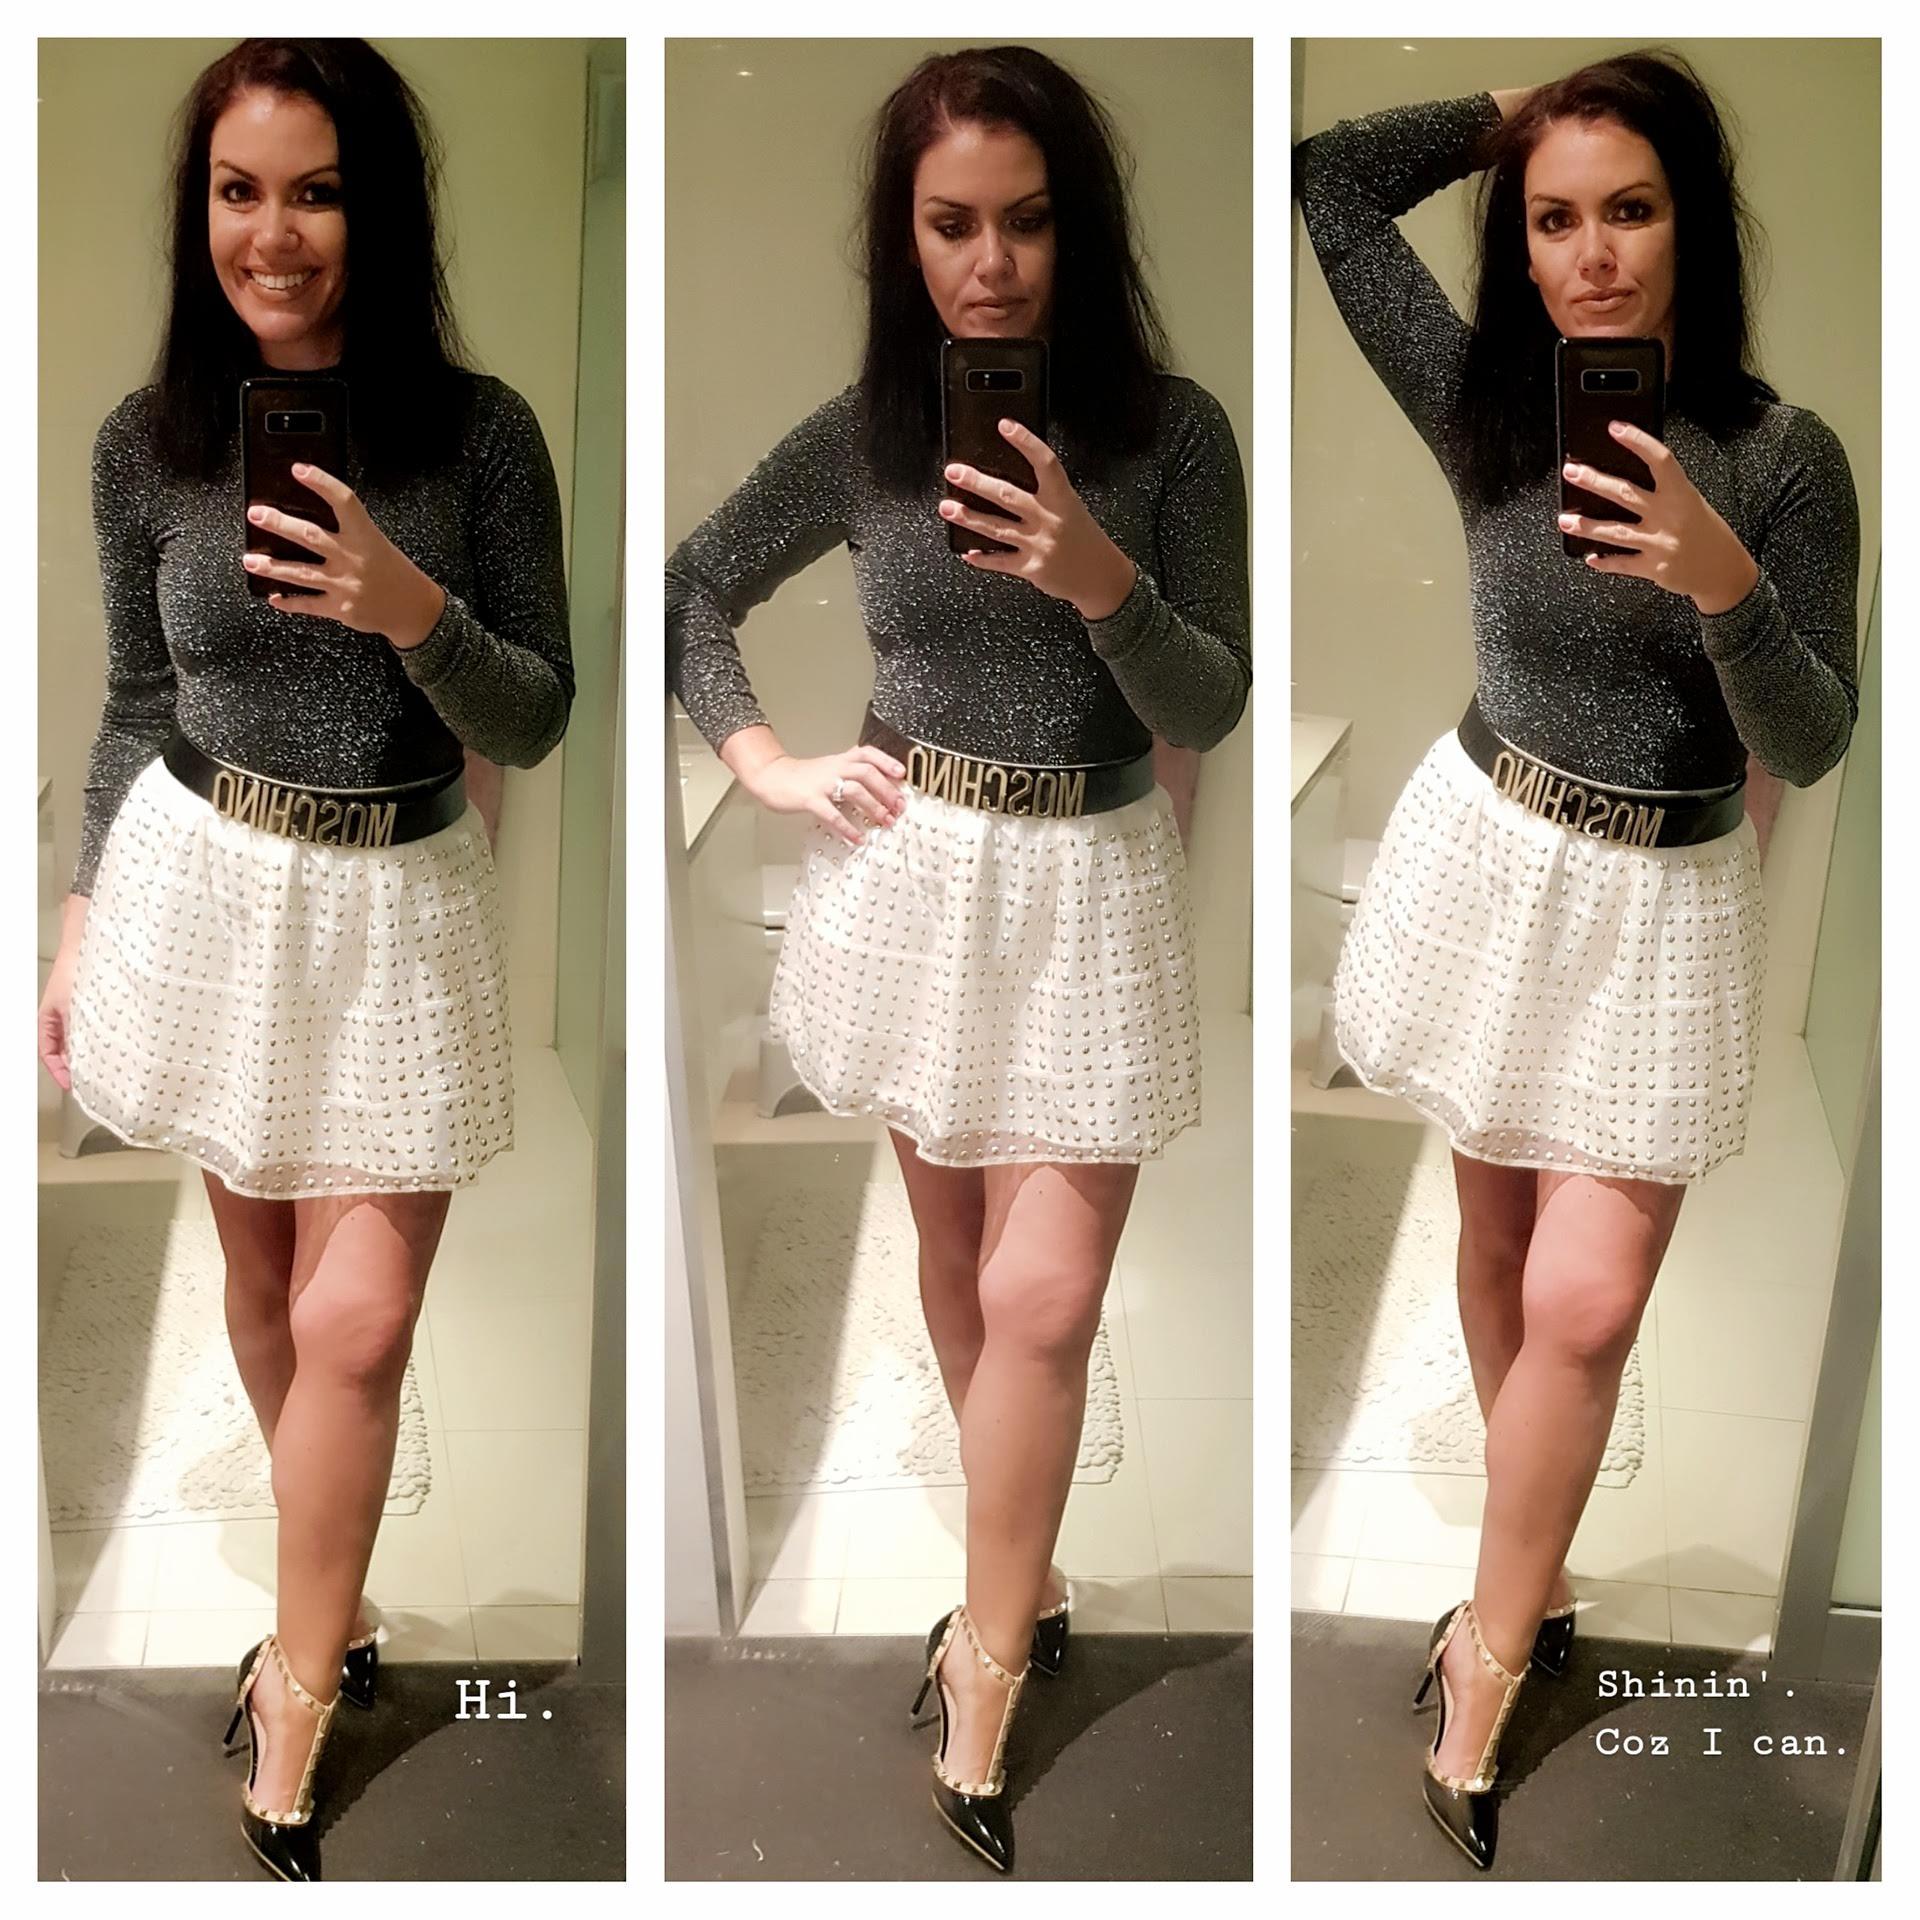 samantha clark waters fashion fun elegant lifestyle level up blog